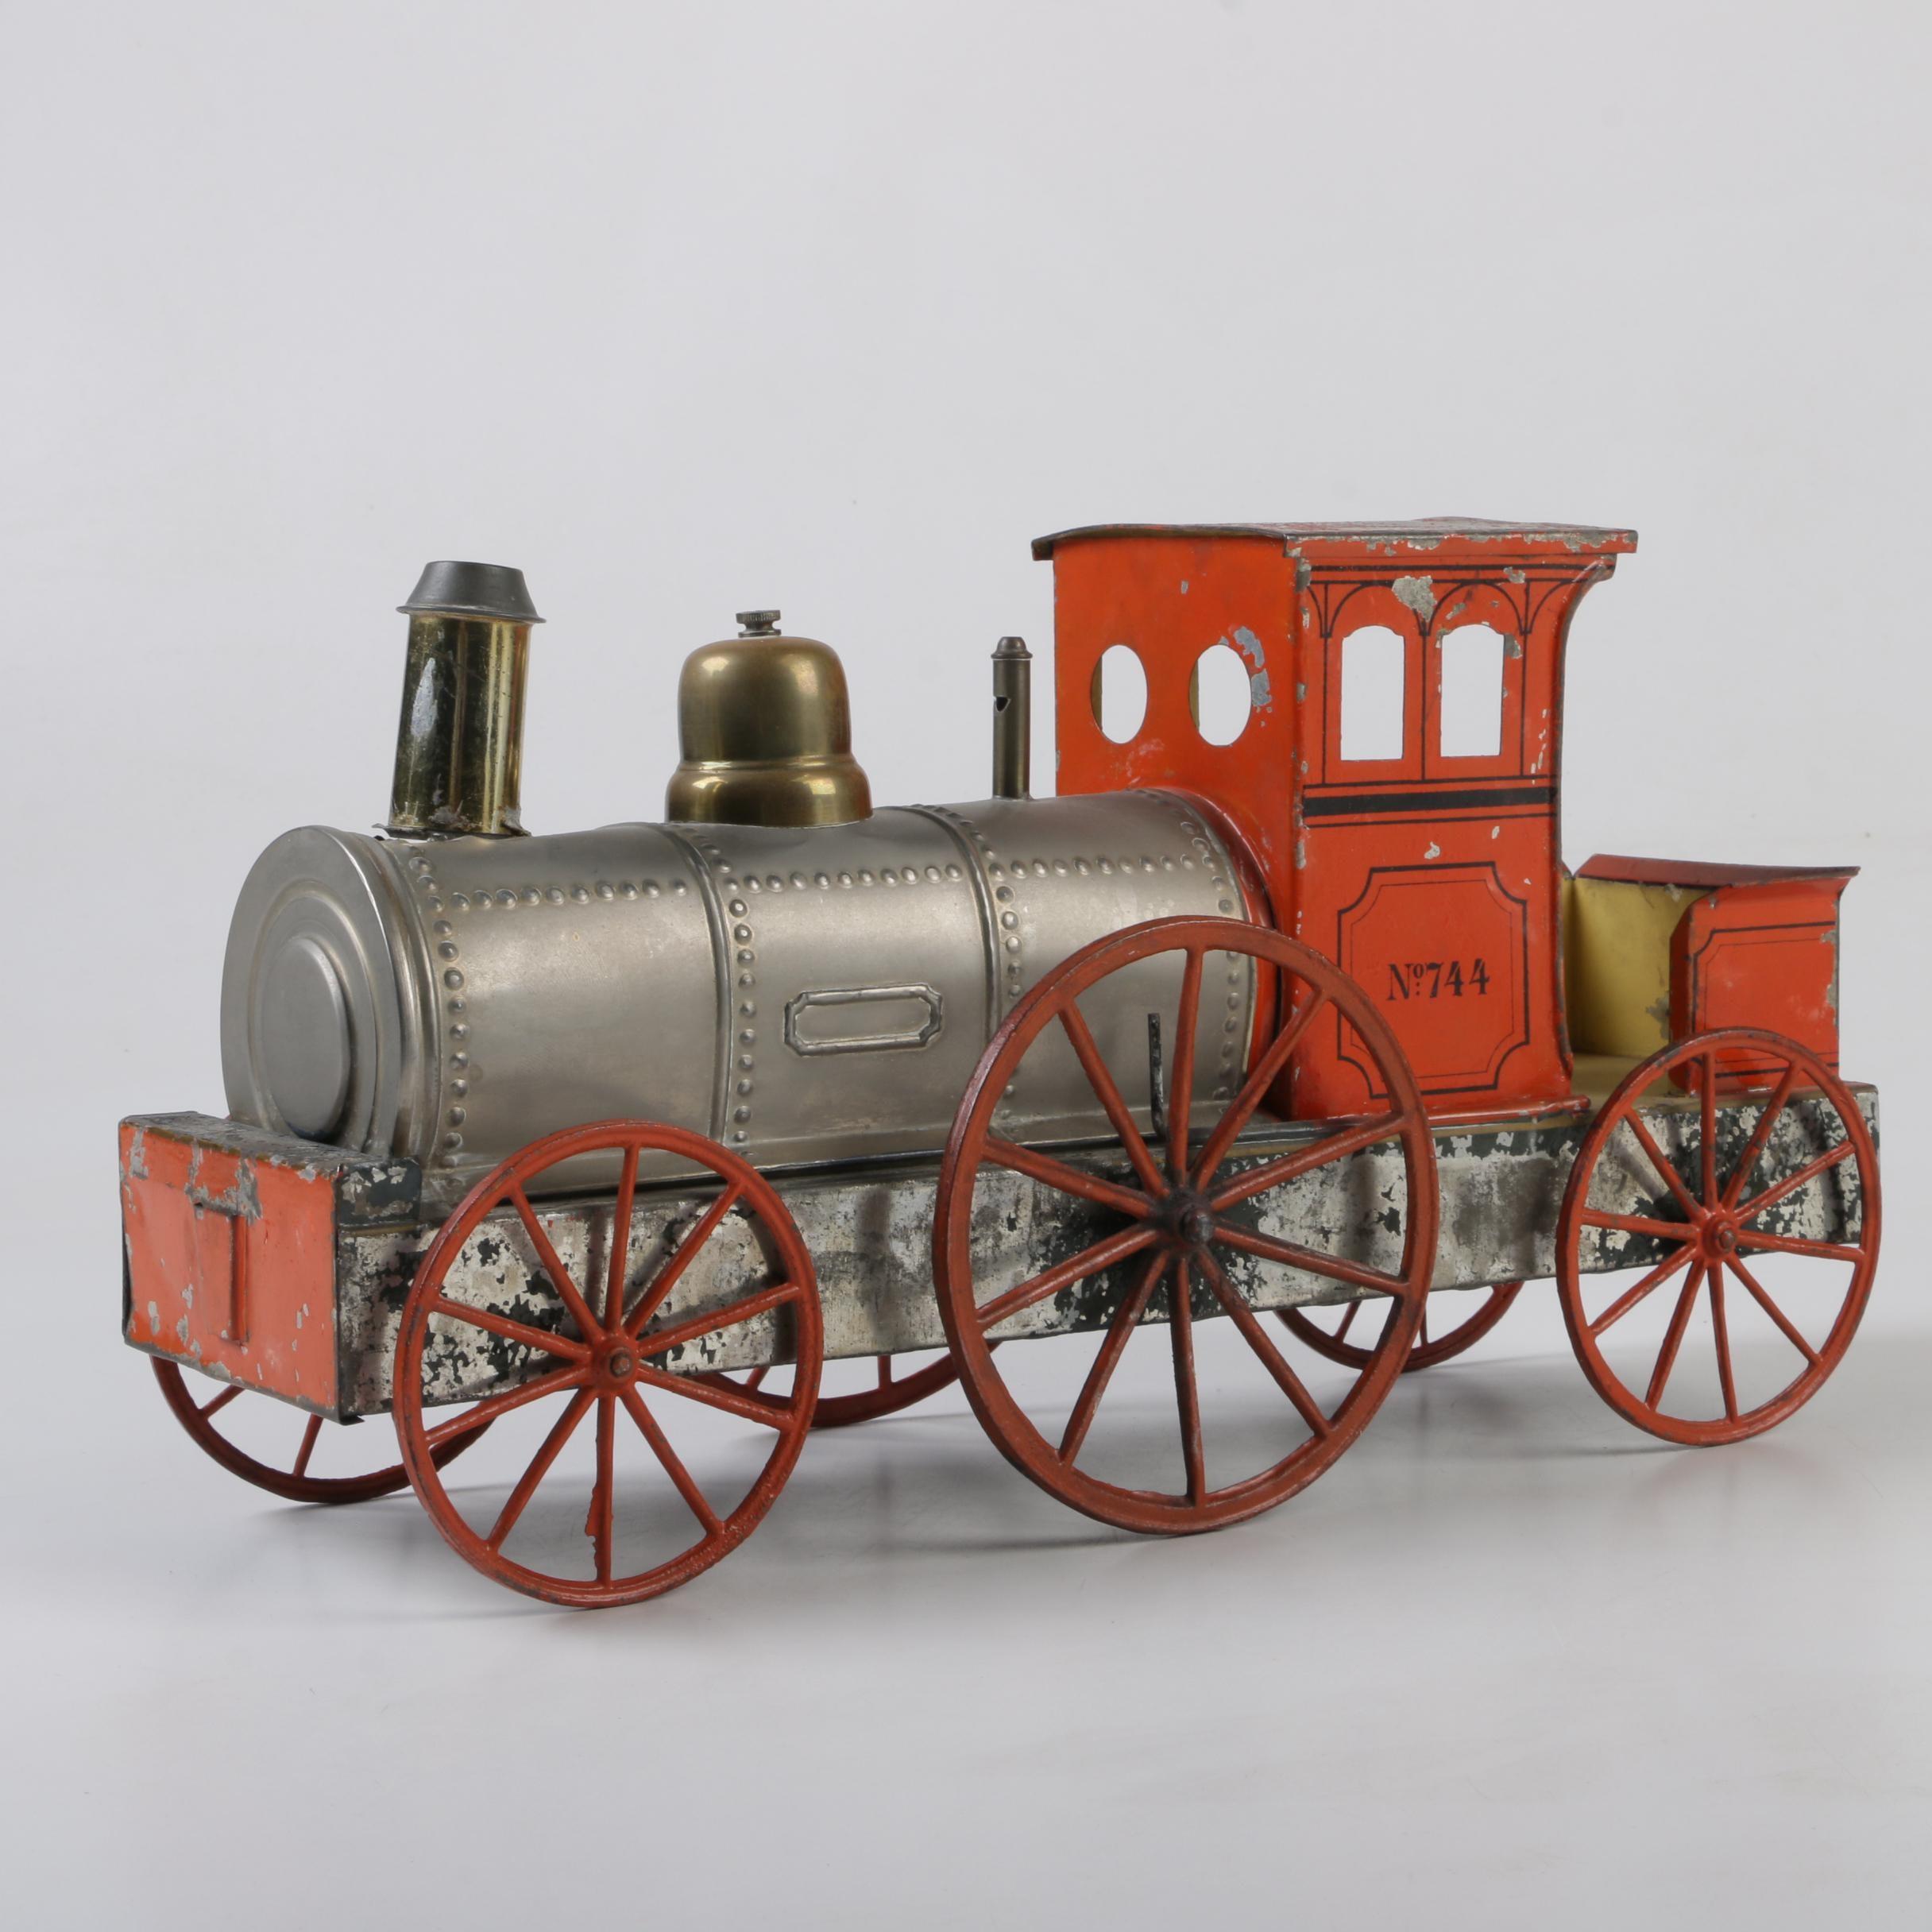 Vintage Tin Model Train Engine No. 744